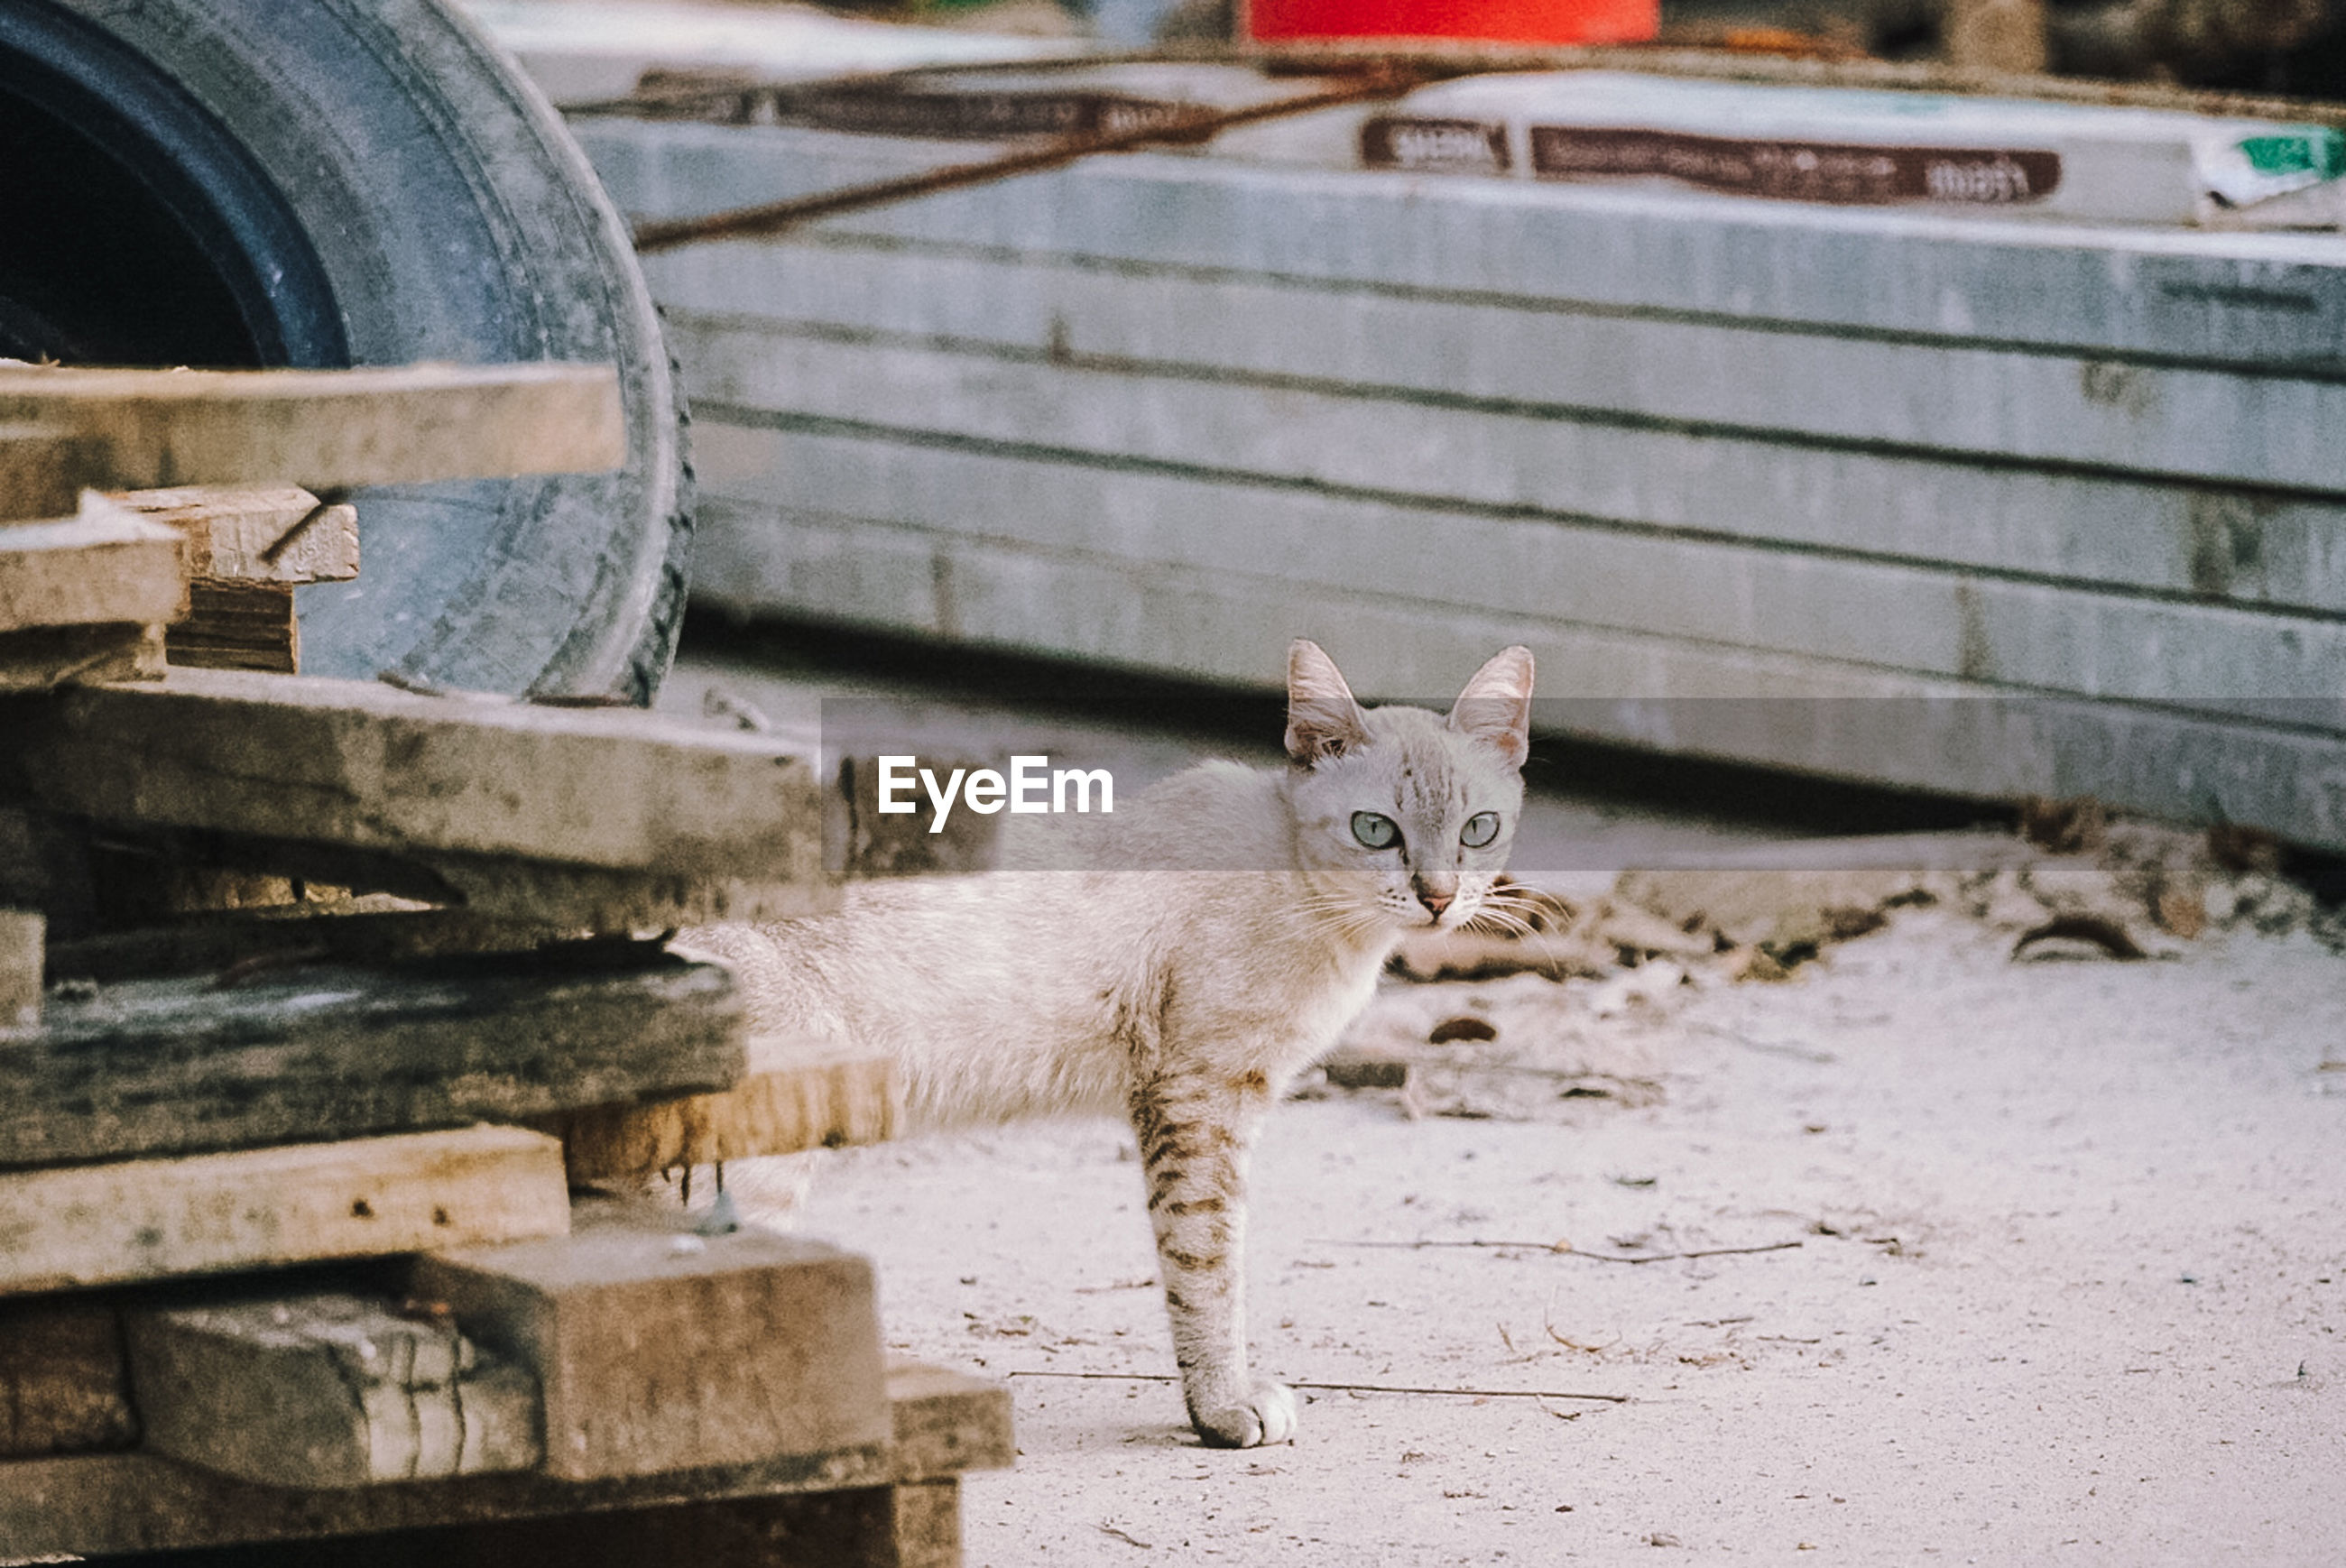 PORTRAIT OF CAT STANDING ON COBBLESTONE